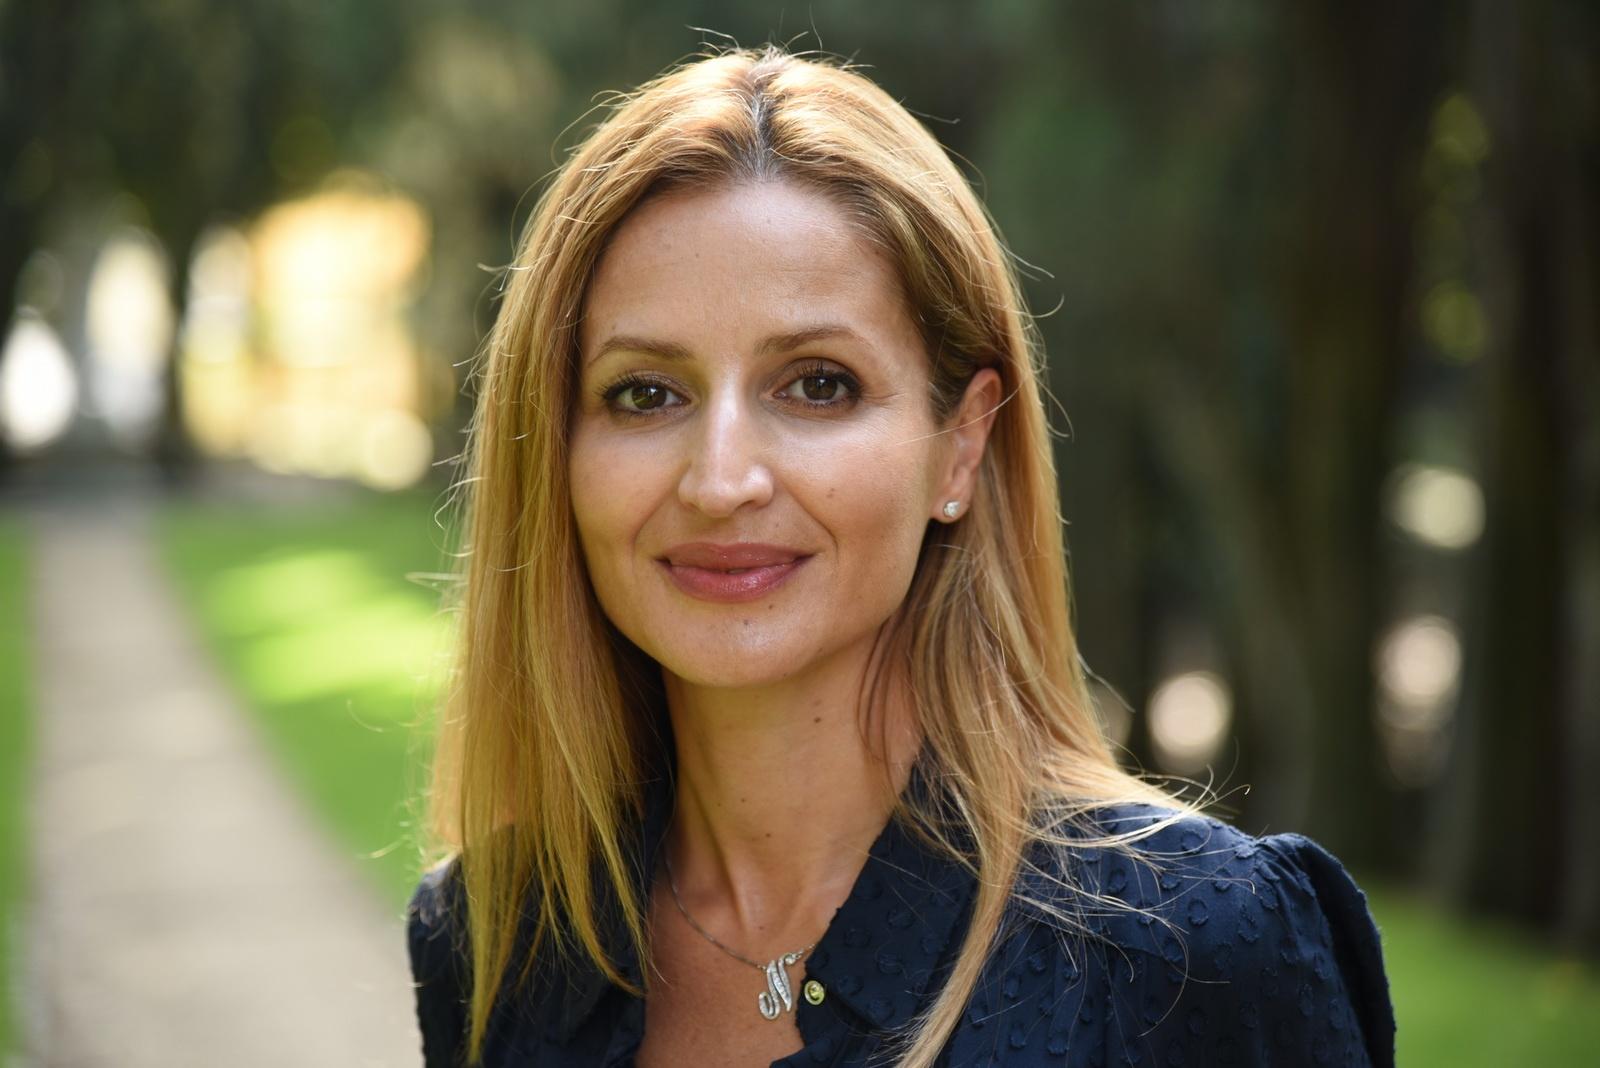 Natacha Fabbri